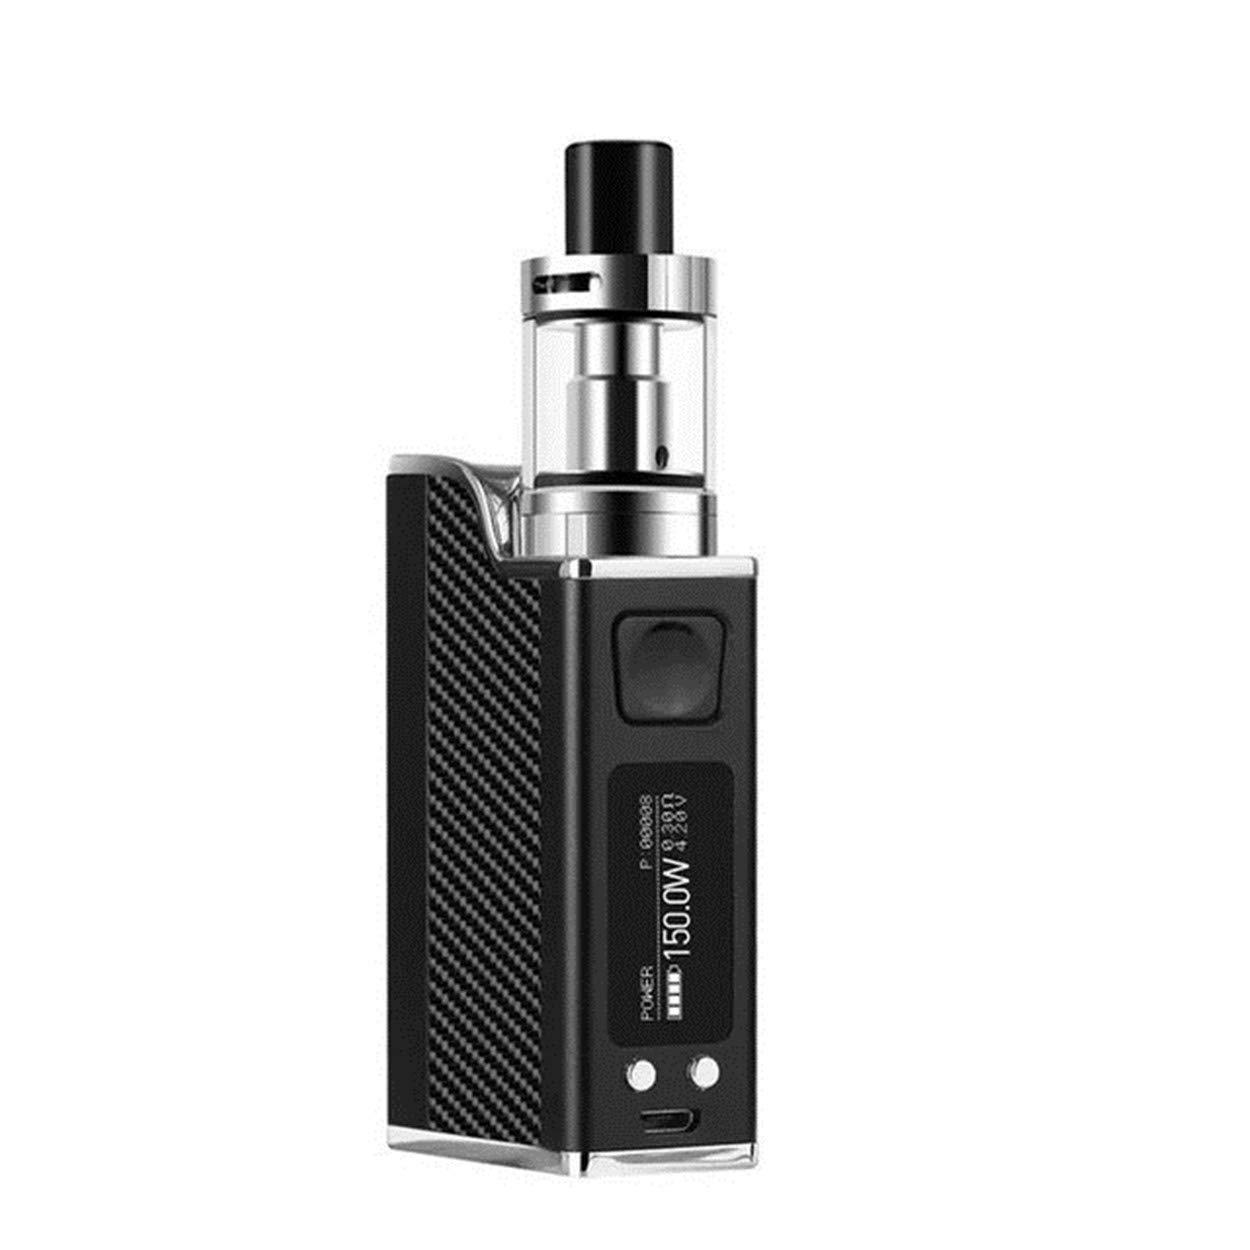 XFDSEXFS VAPE High power black oil pen, tank box with adjustable power